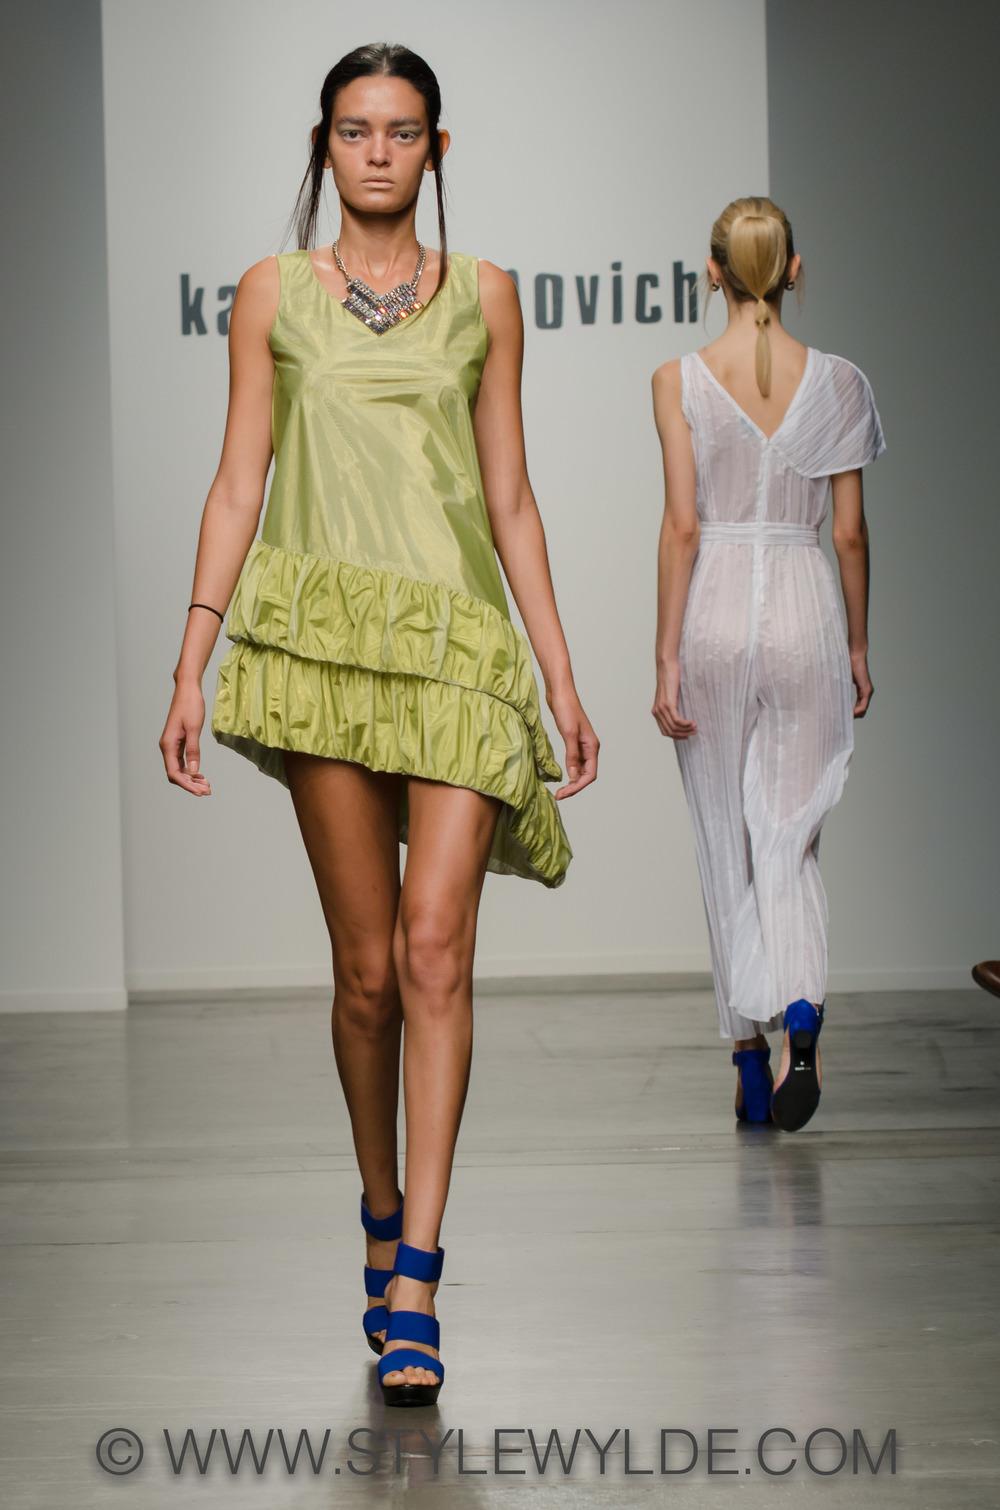 StyleWylde_KatyaSS15_FOH (11 of 28).jpg